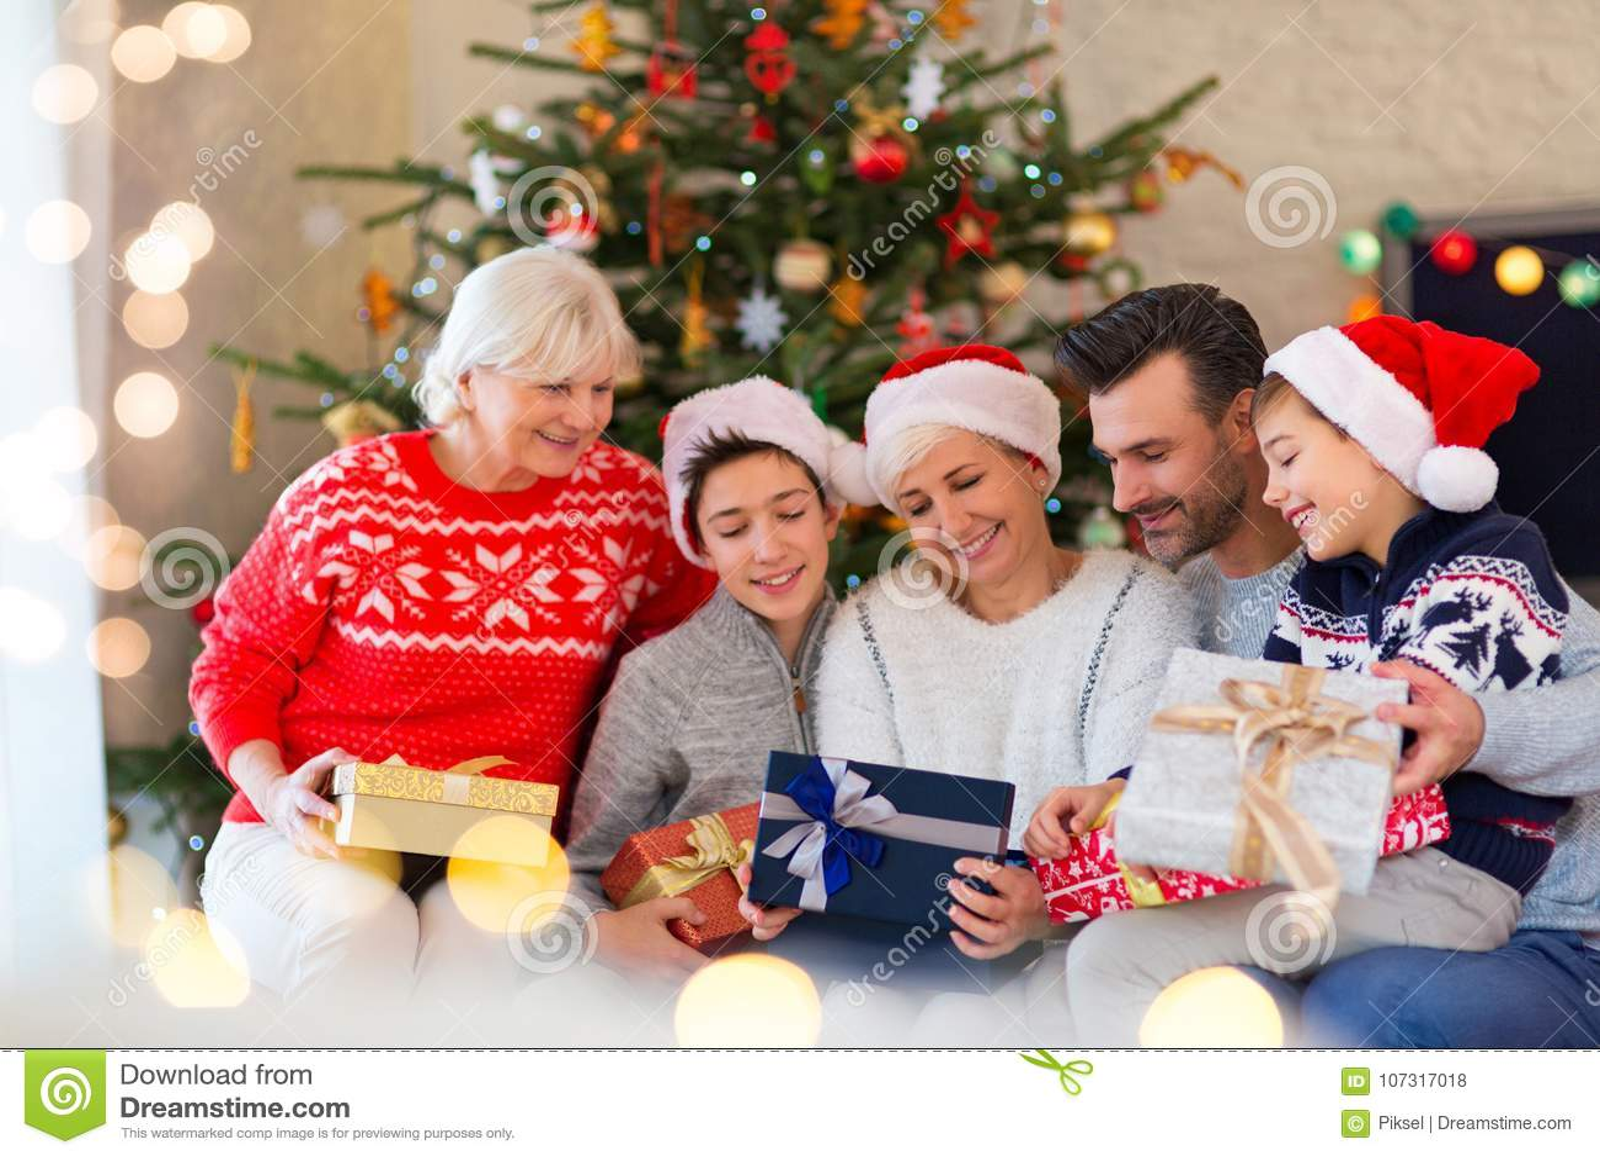 download family with christmas presents stock photo image of christmas grandma 107317018